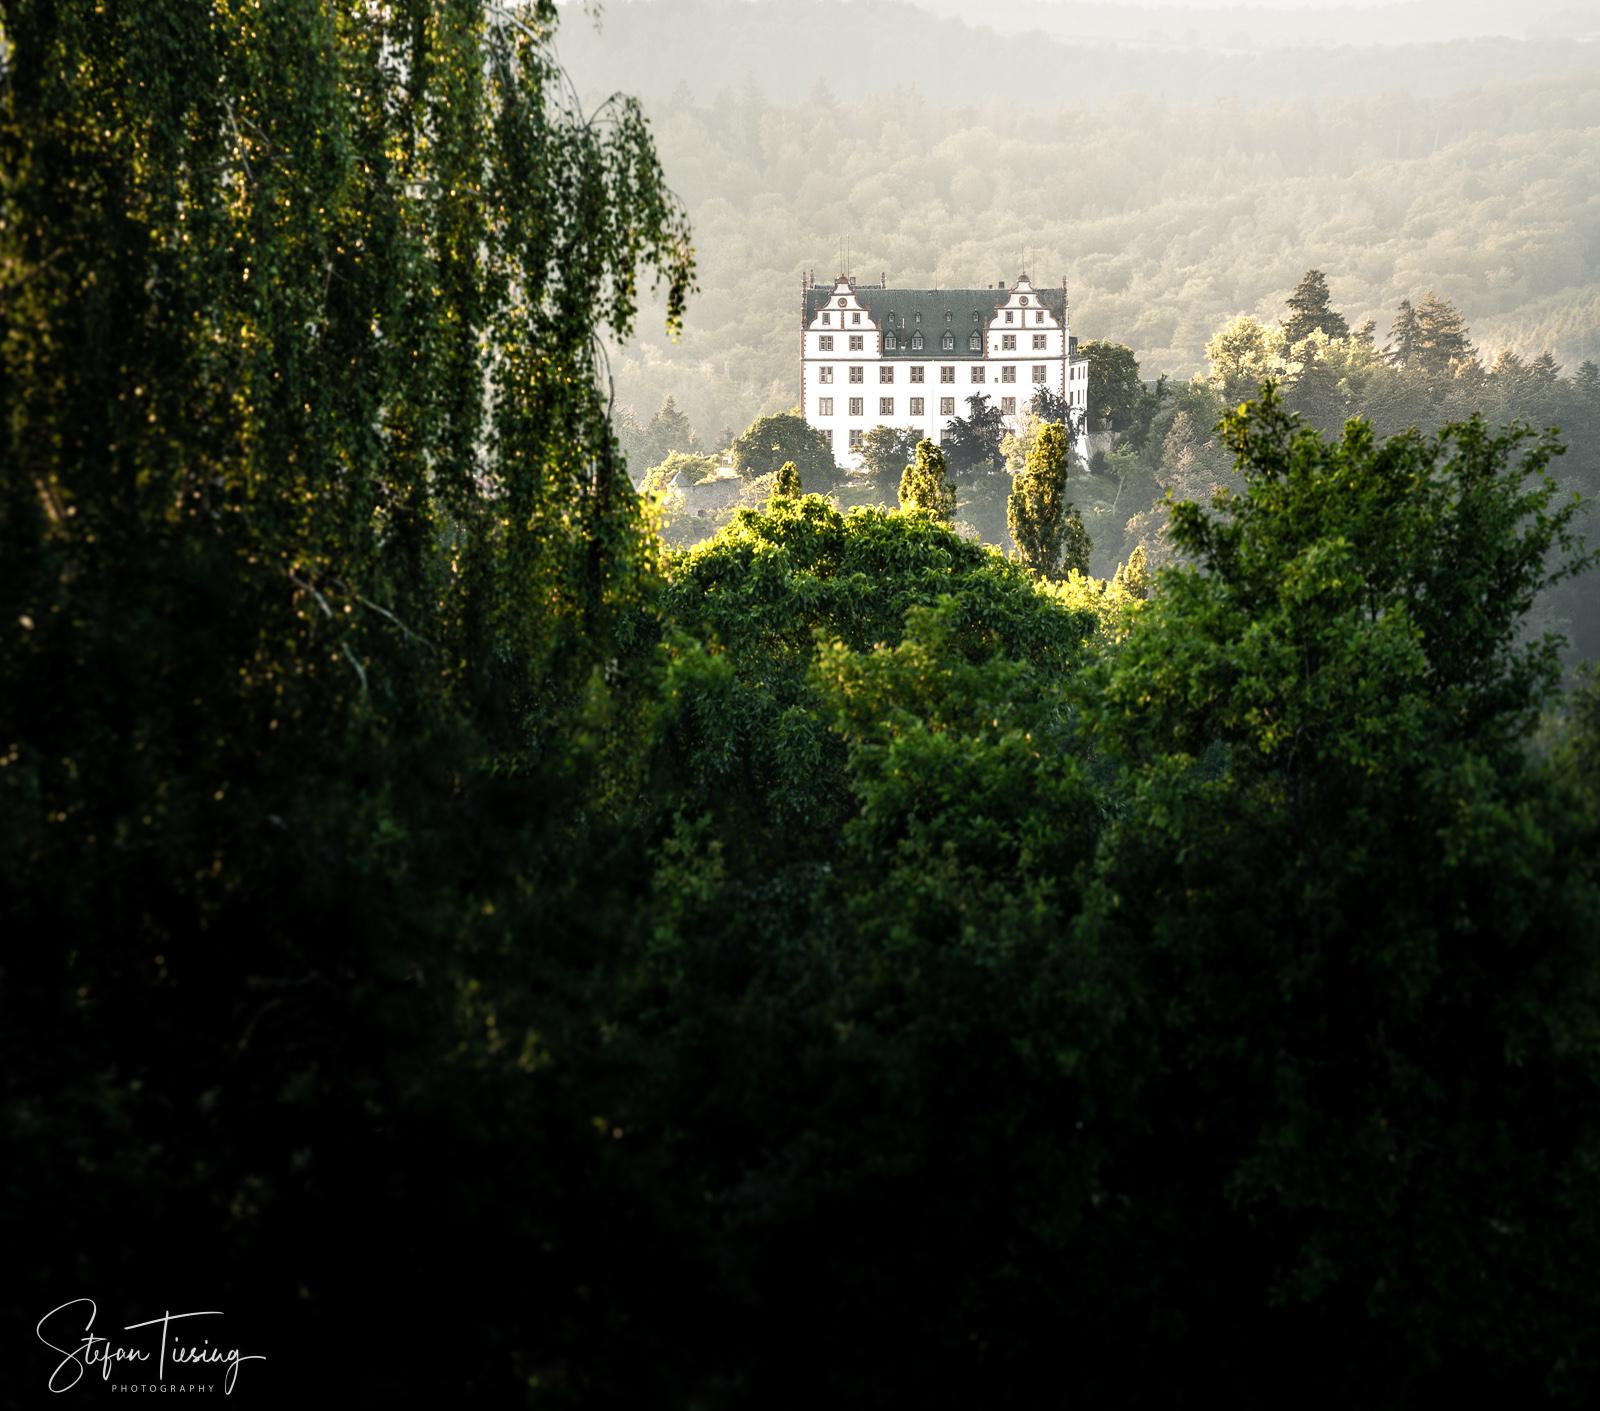 Schloss Lichtenberg, Germany